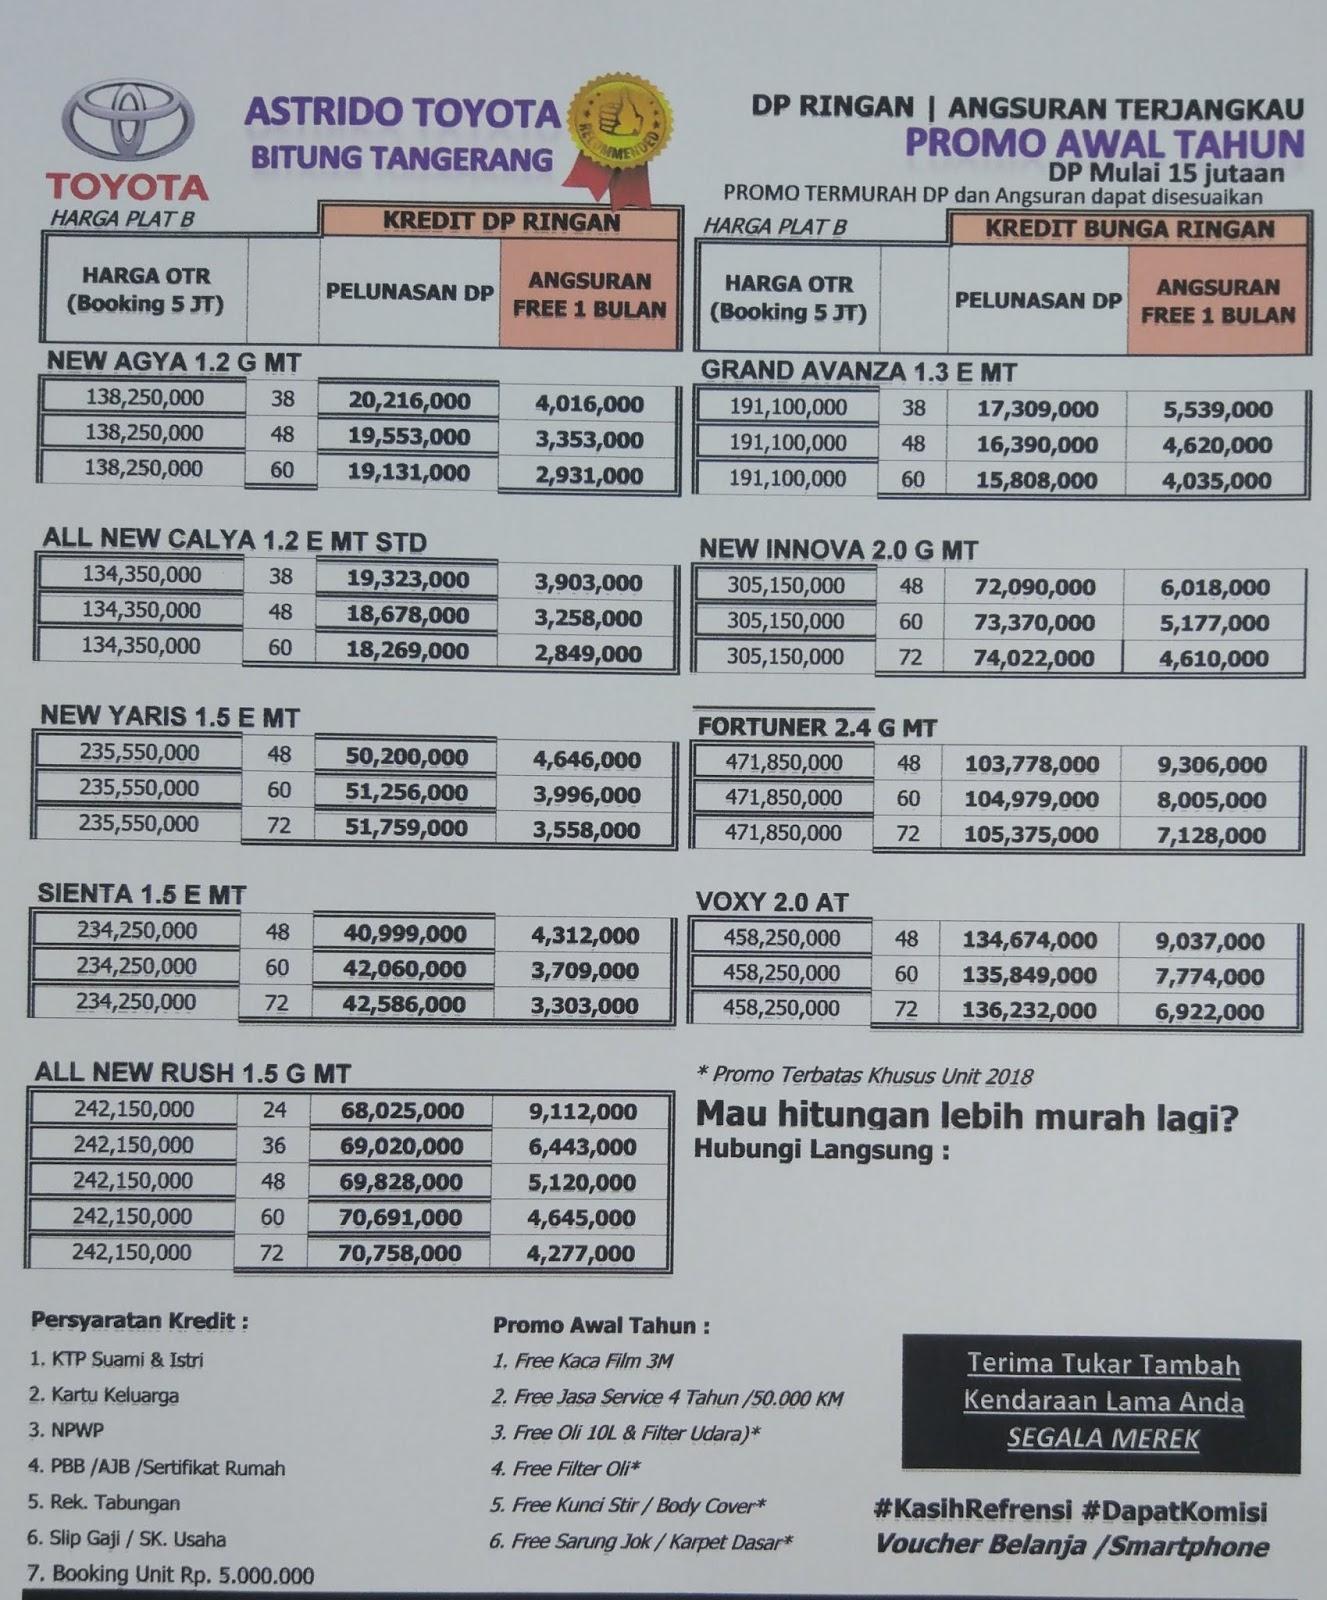 Pricelist Toyota Januari 2019